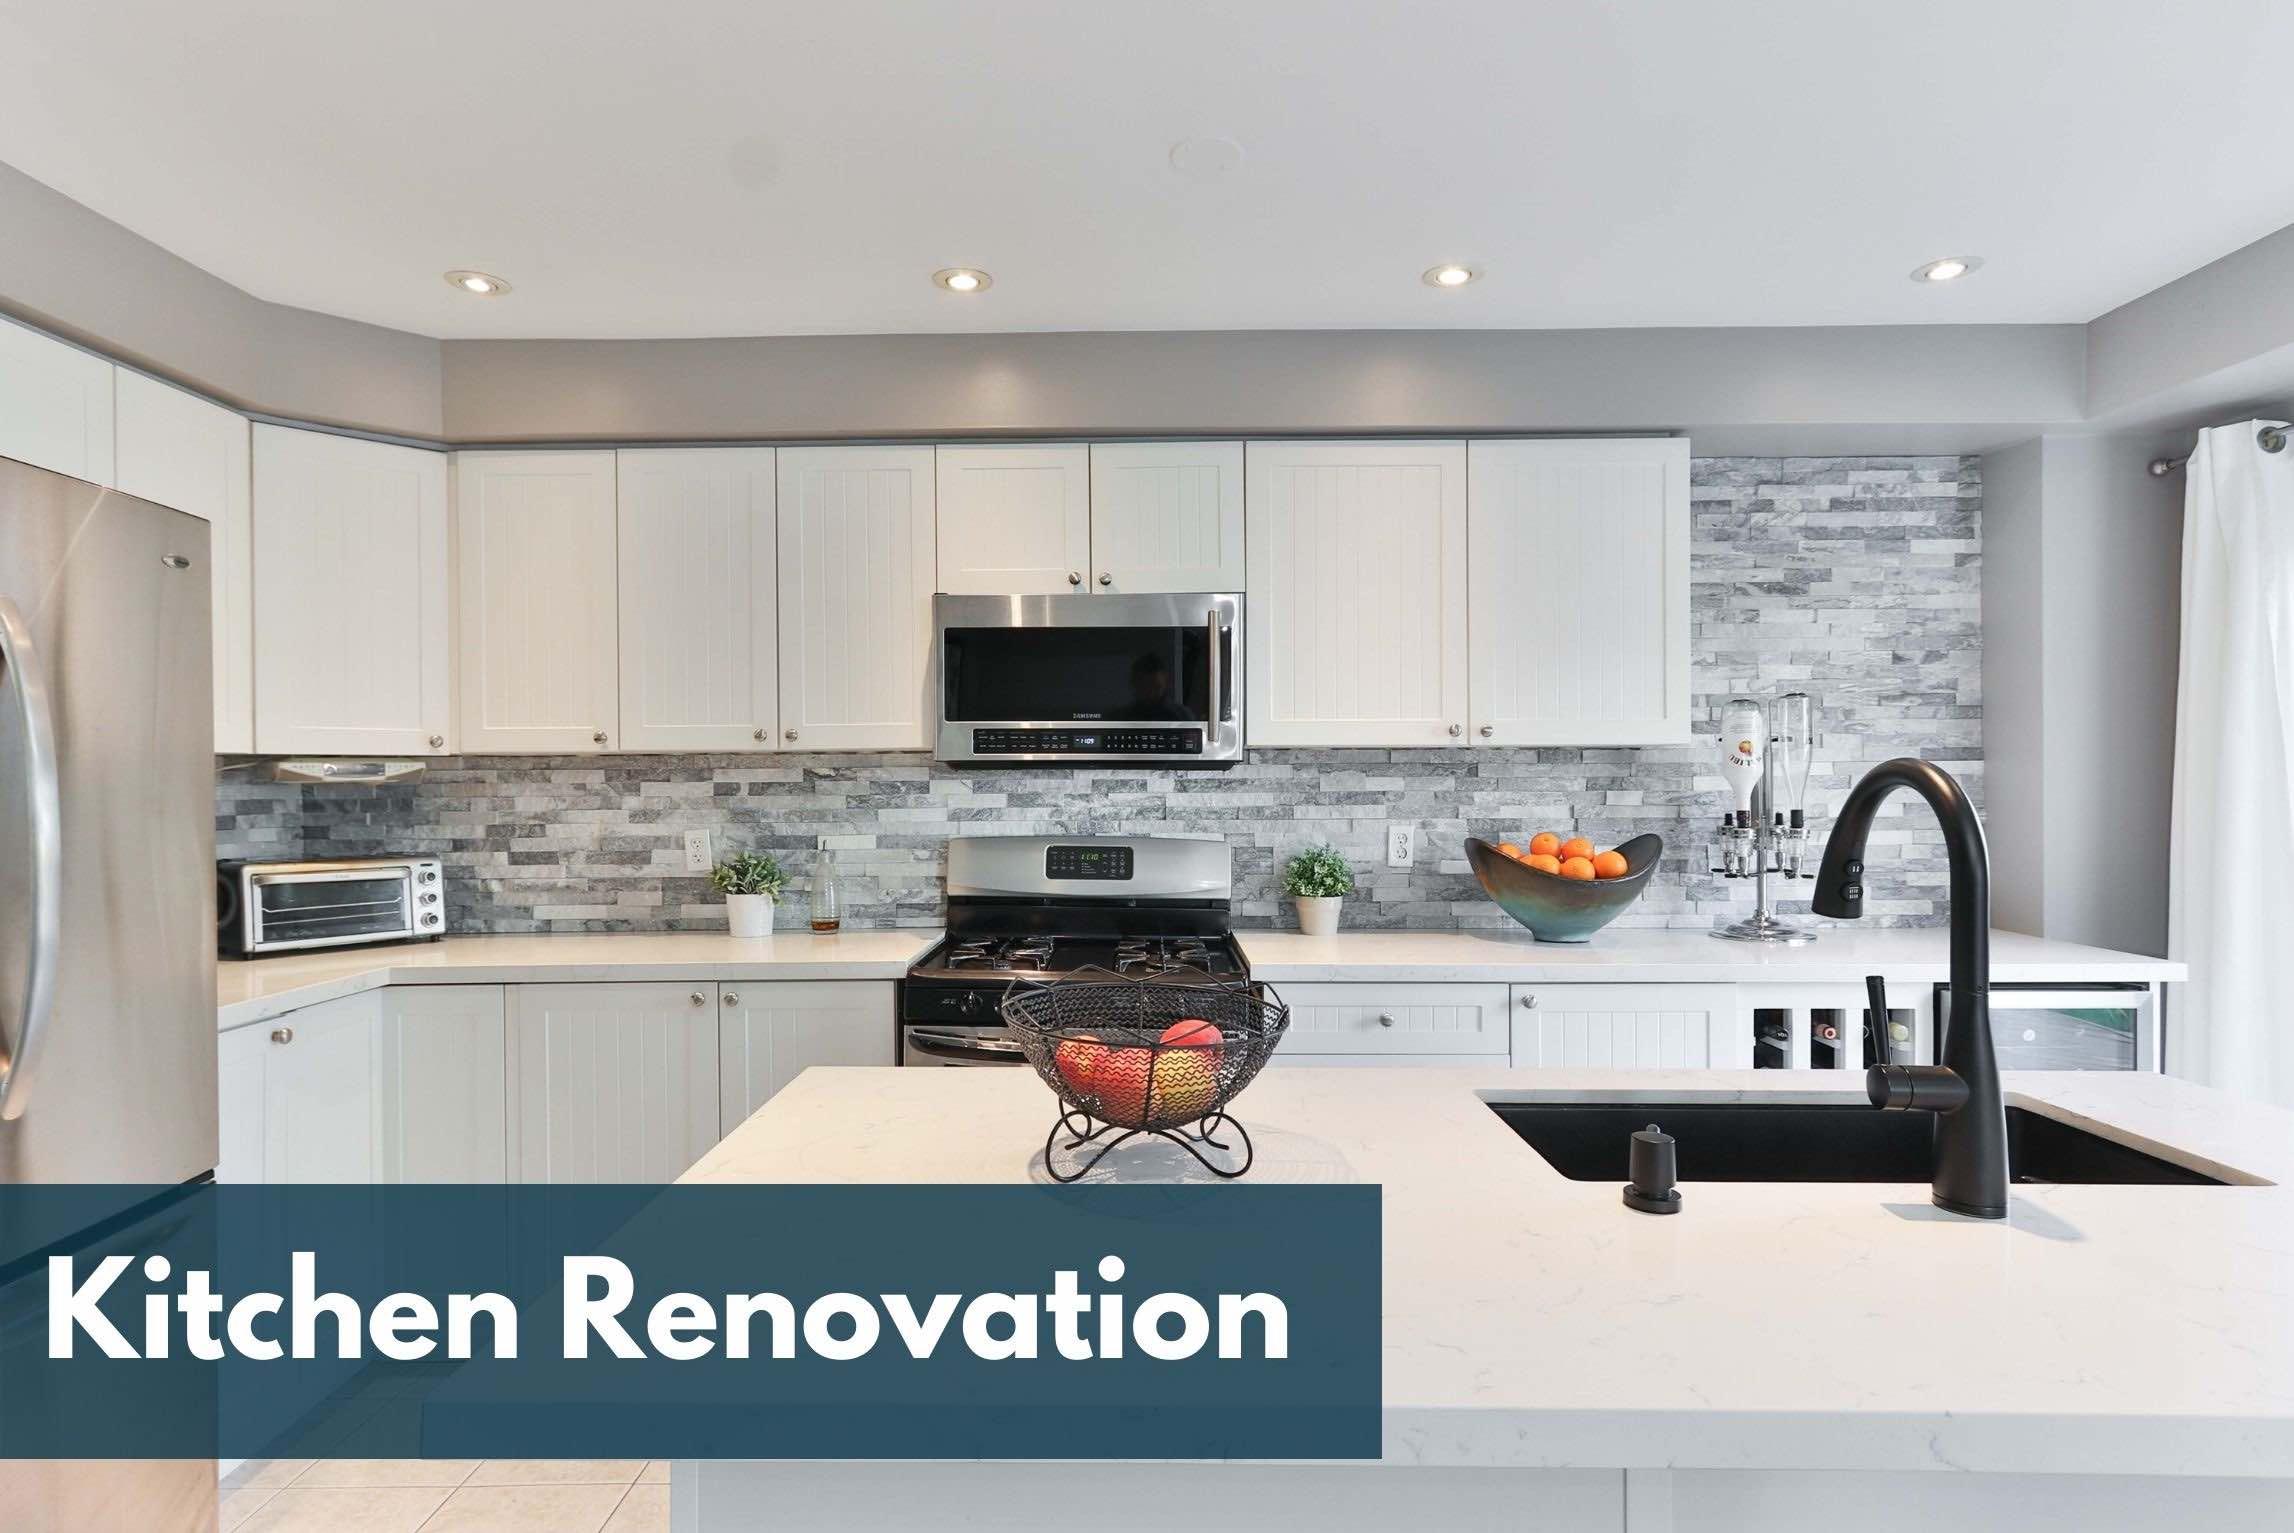 Renovation Tips